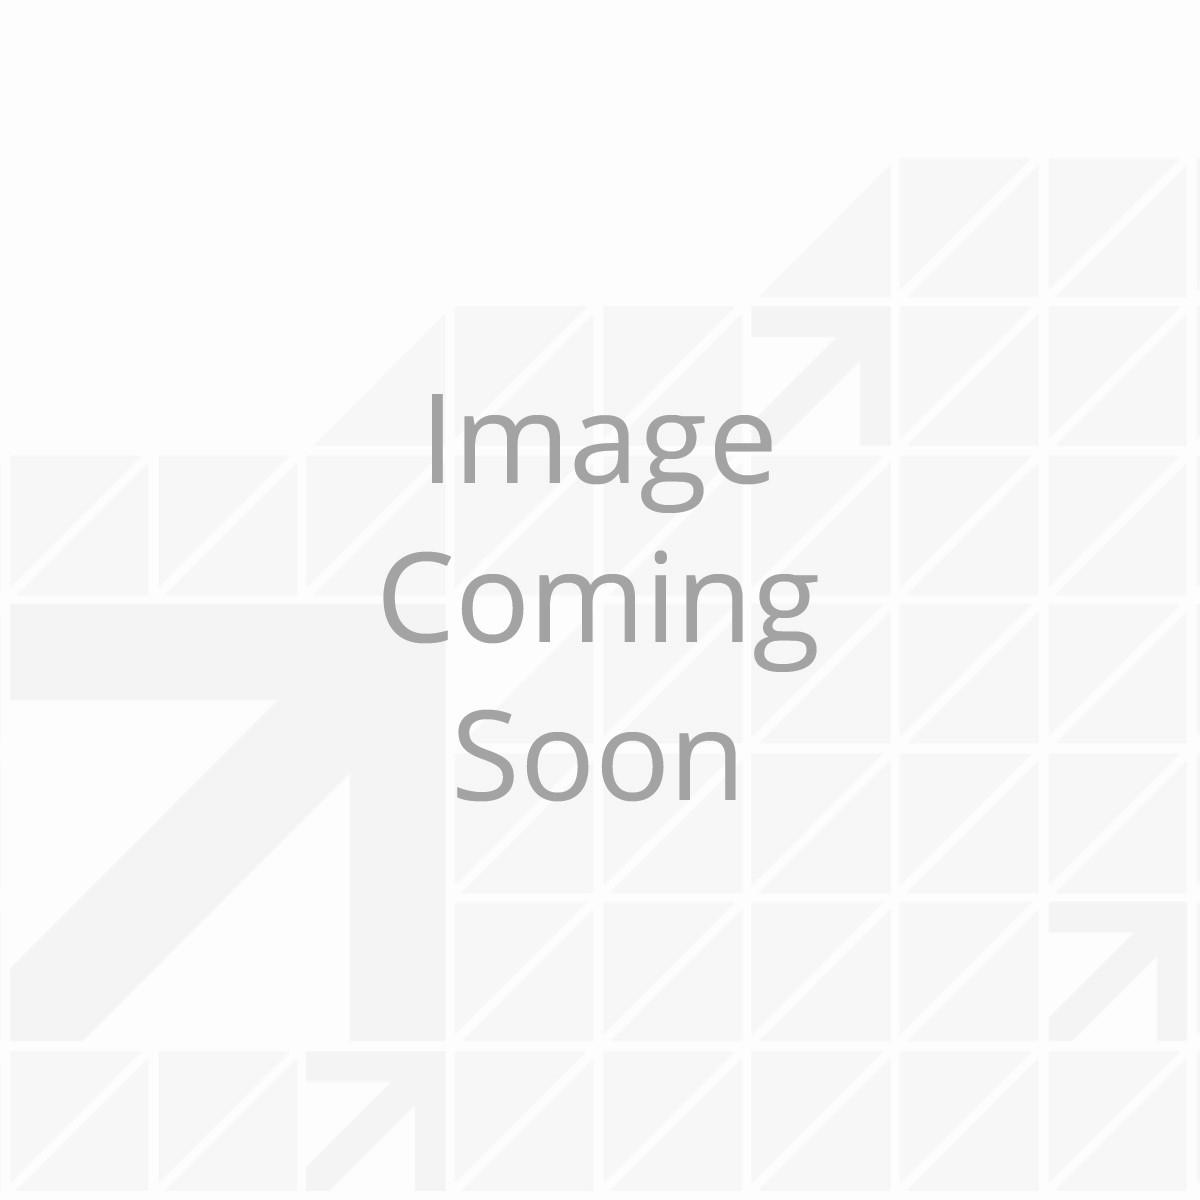 Furrion Mini Fridge 1.7 Cubic Ft./48 L AC (FCR17ACA-BL)